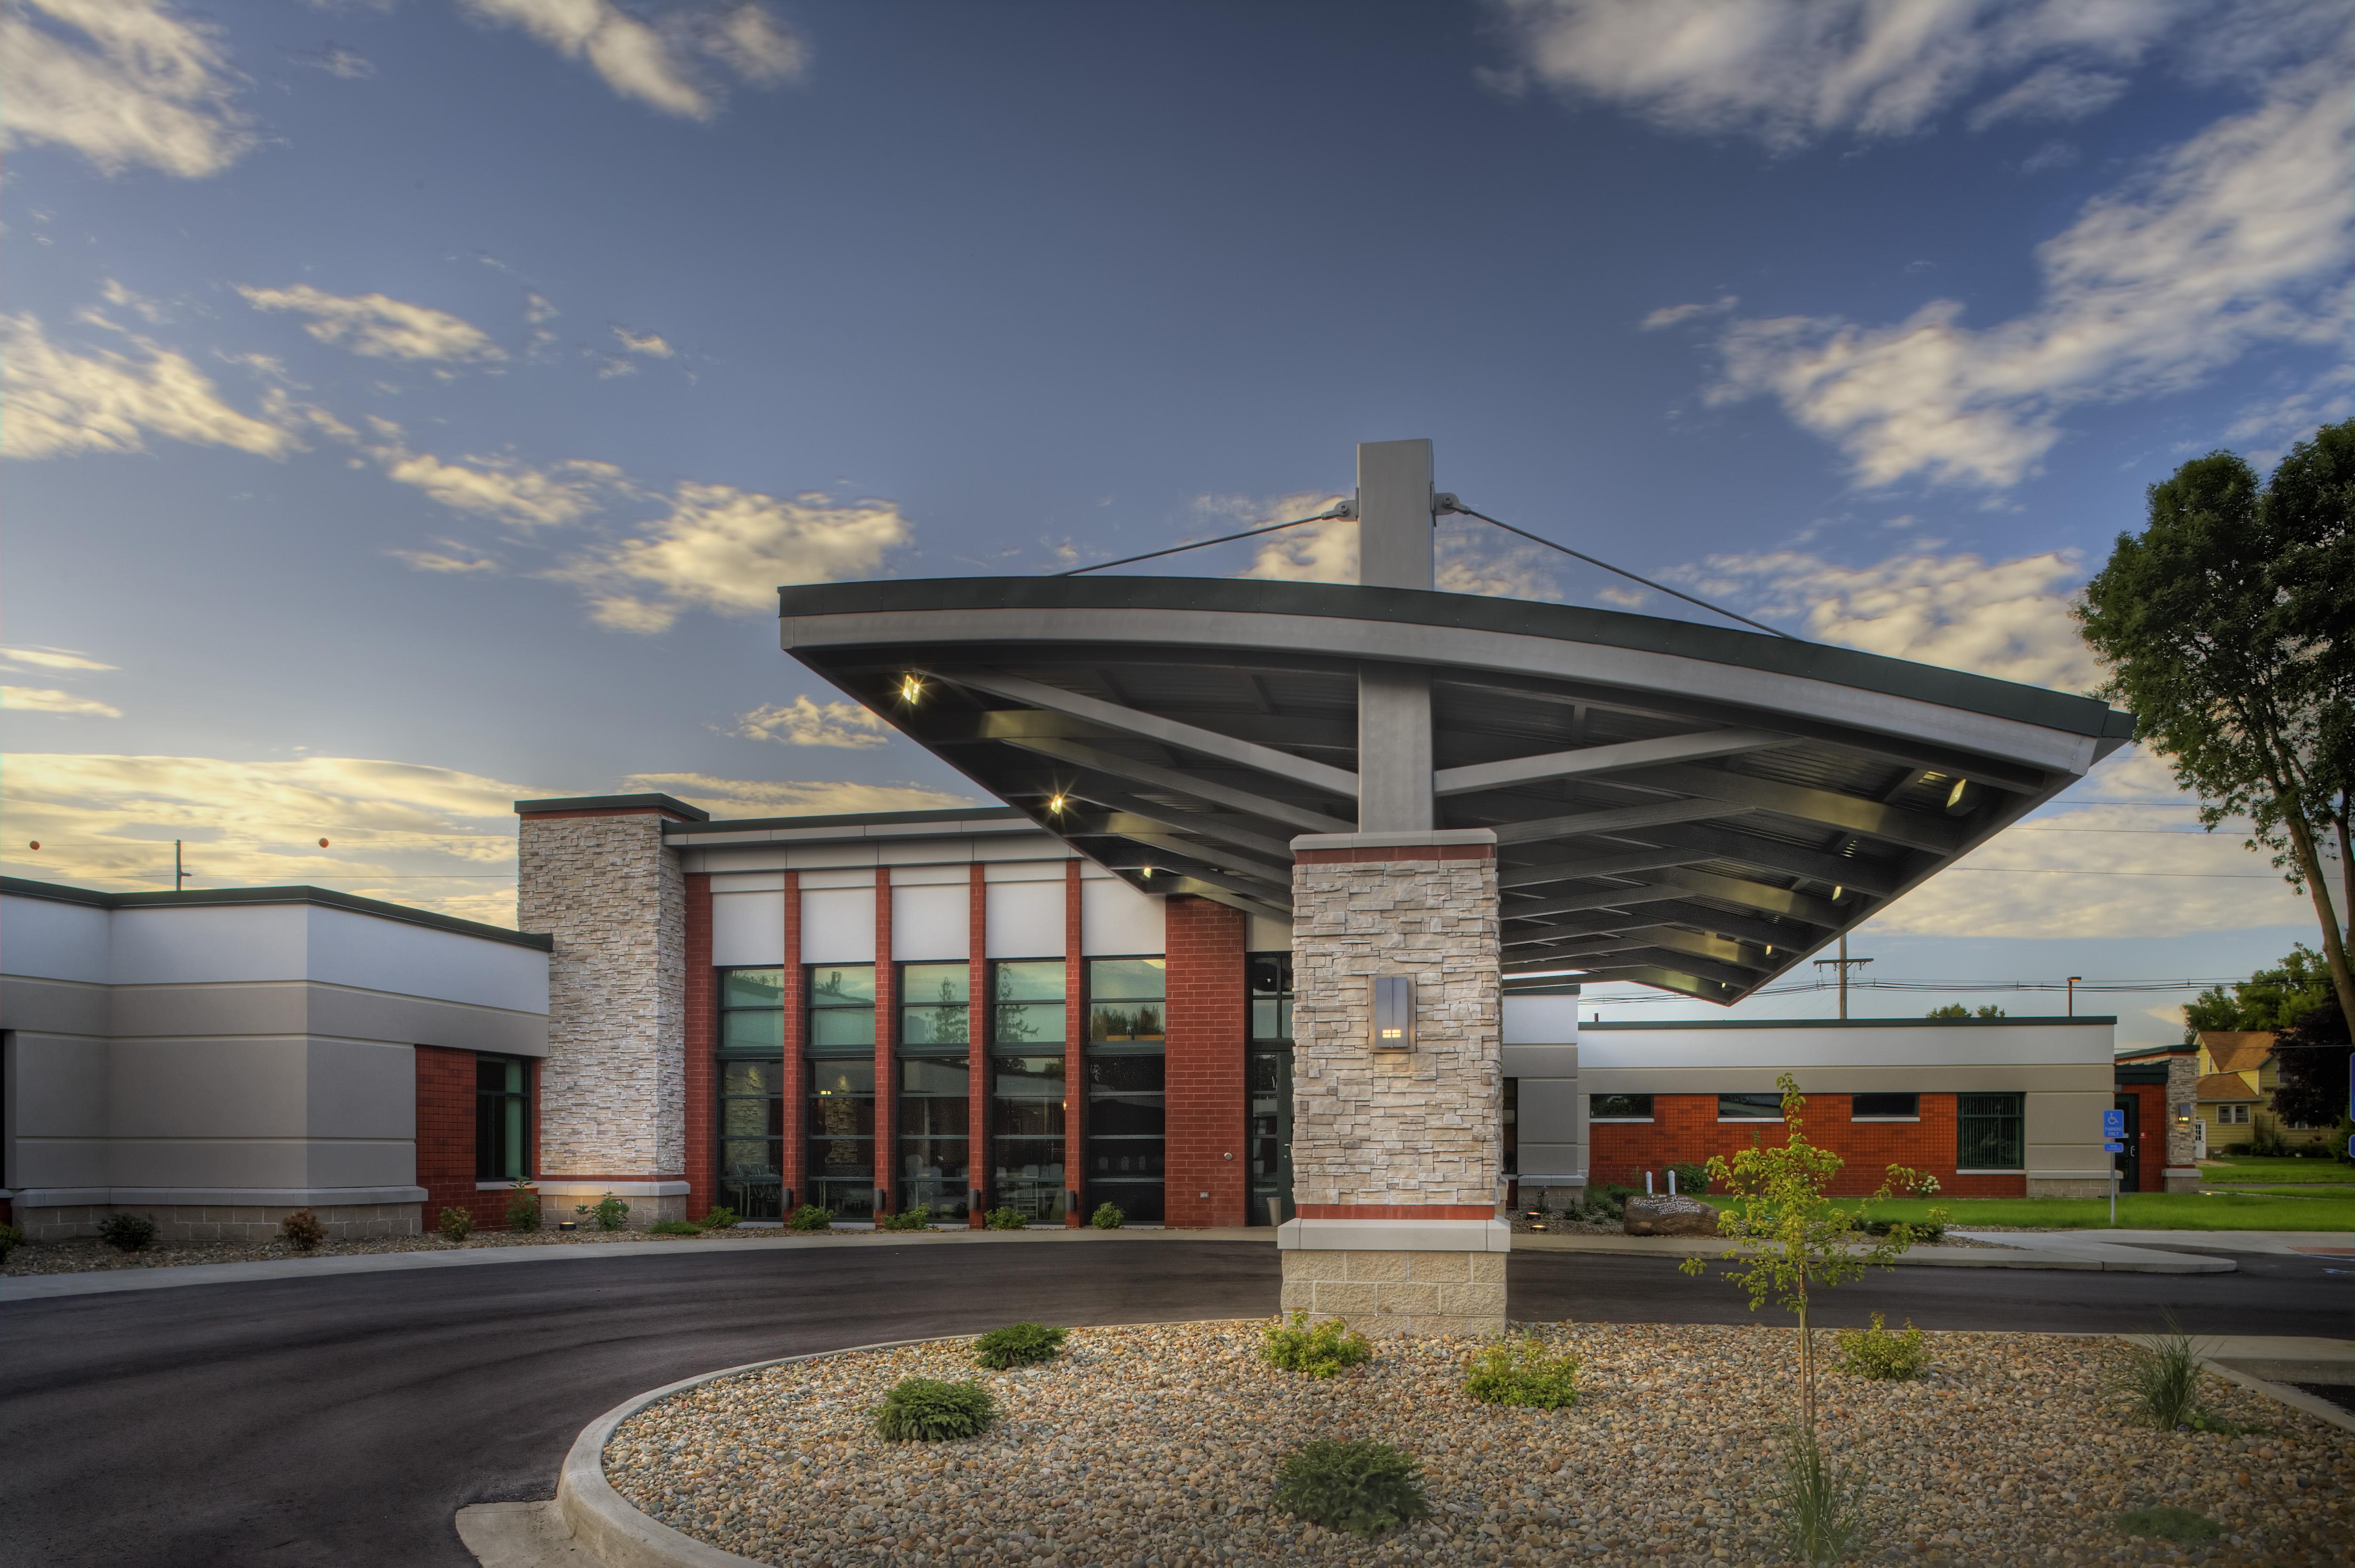 MERCY MEDICAL CENTER - NEW HAMPTON